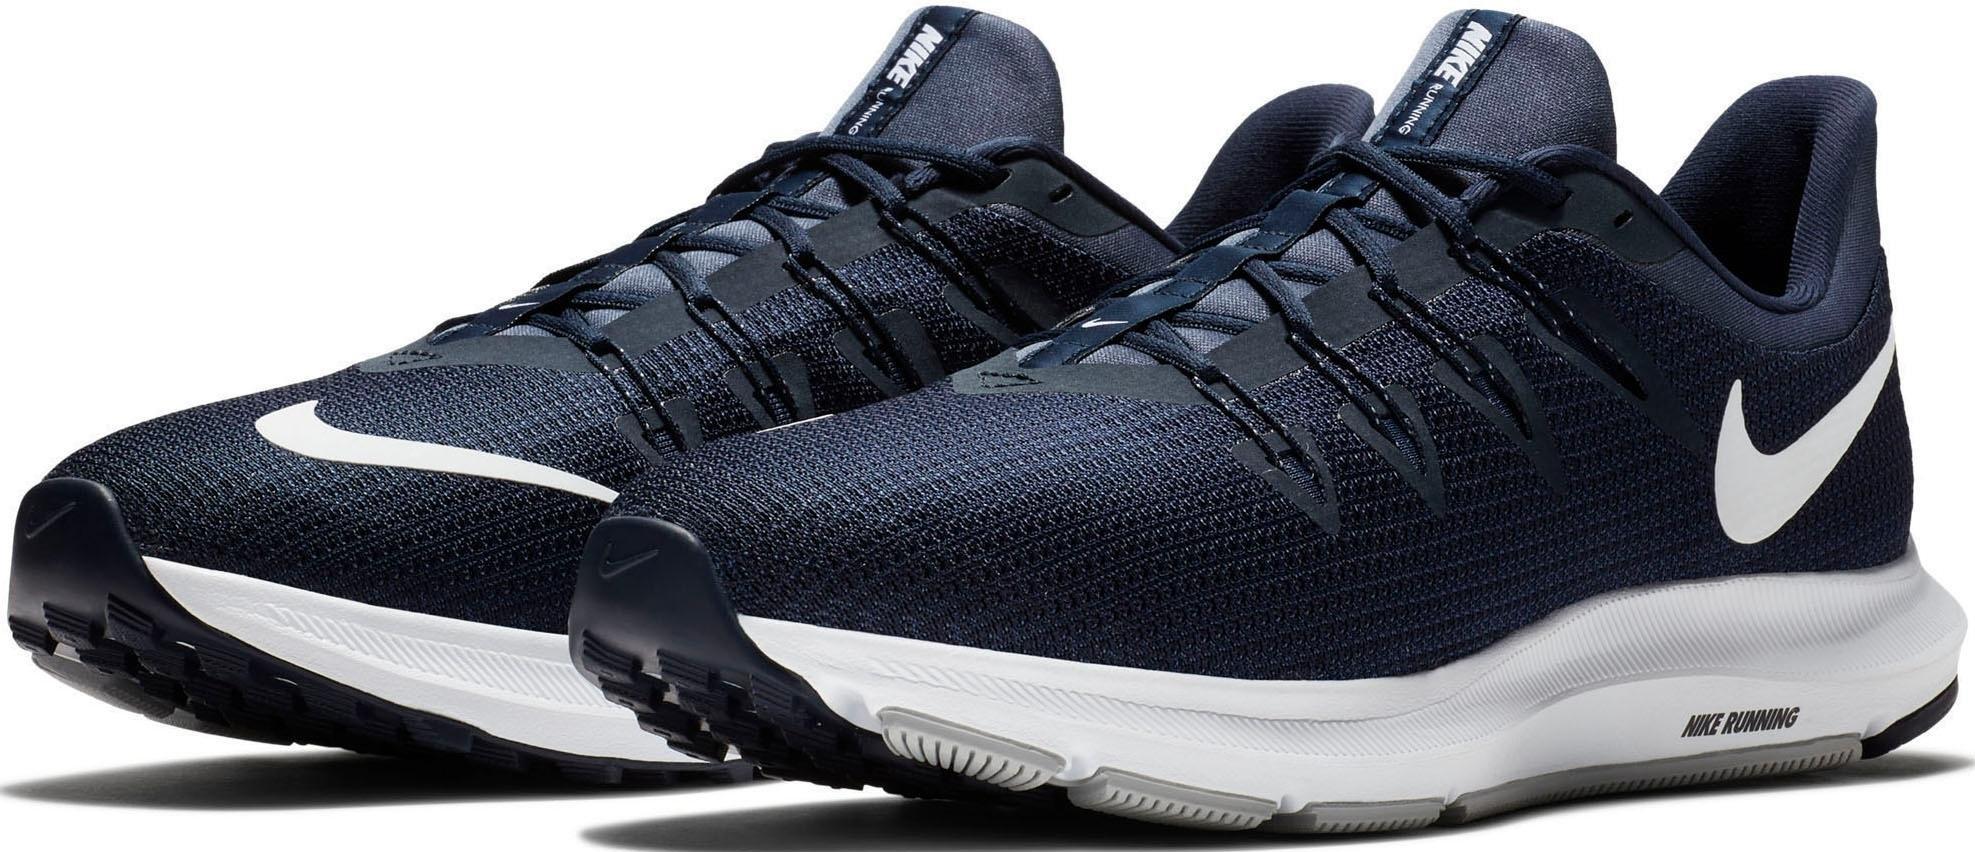 the latest 16c79 f7bcd ... runningschoenen »Revolution 4«, adidas runningschoenen »Duramo Lite 2.0  M«, Nike runningschoenen »Flex Contact 2«, adidas runningschoenen »Duramo 9«